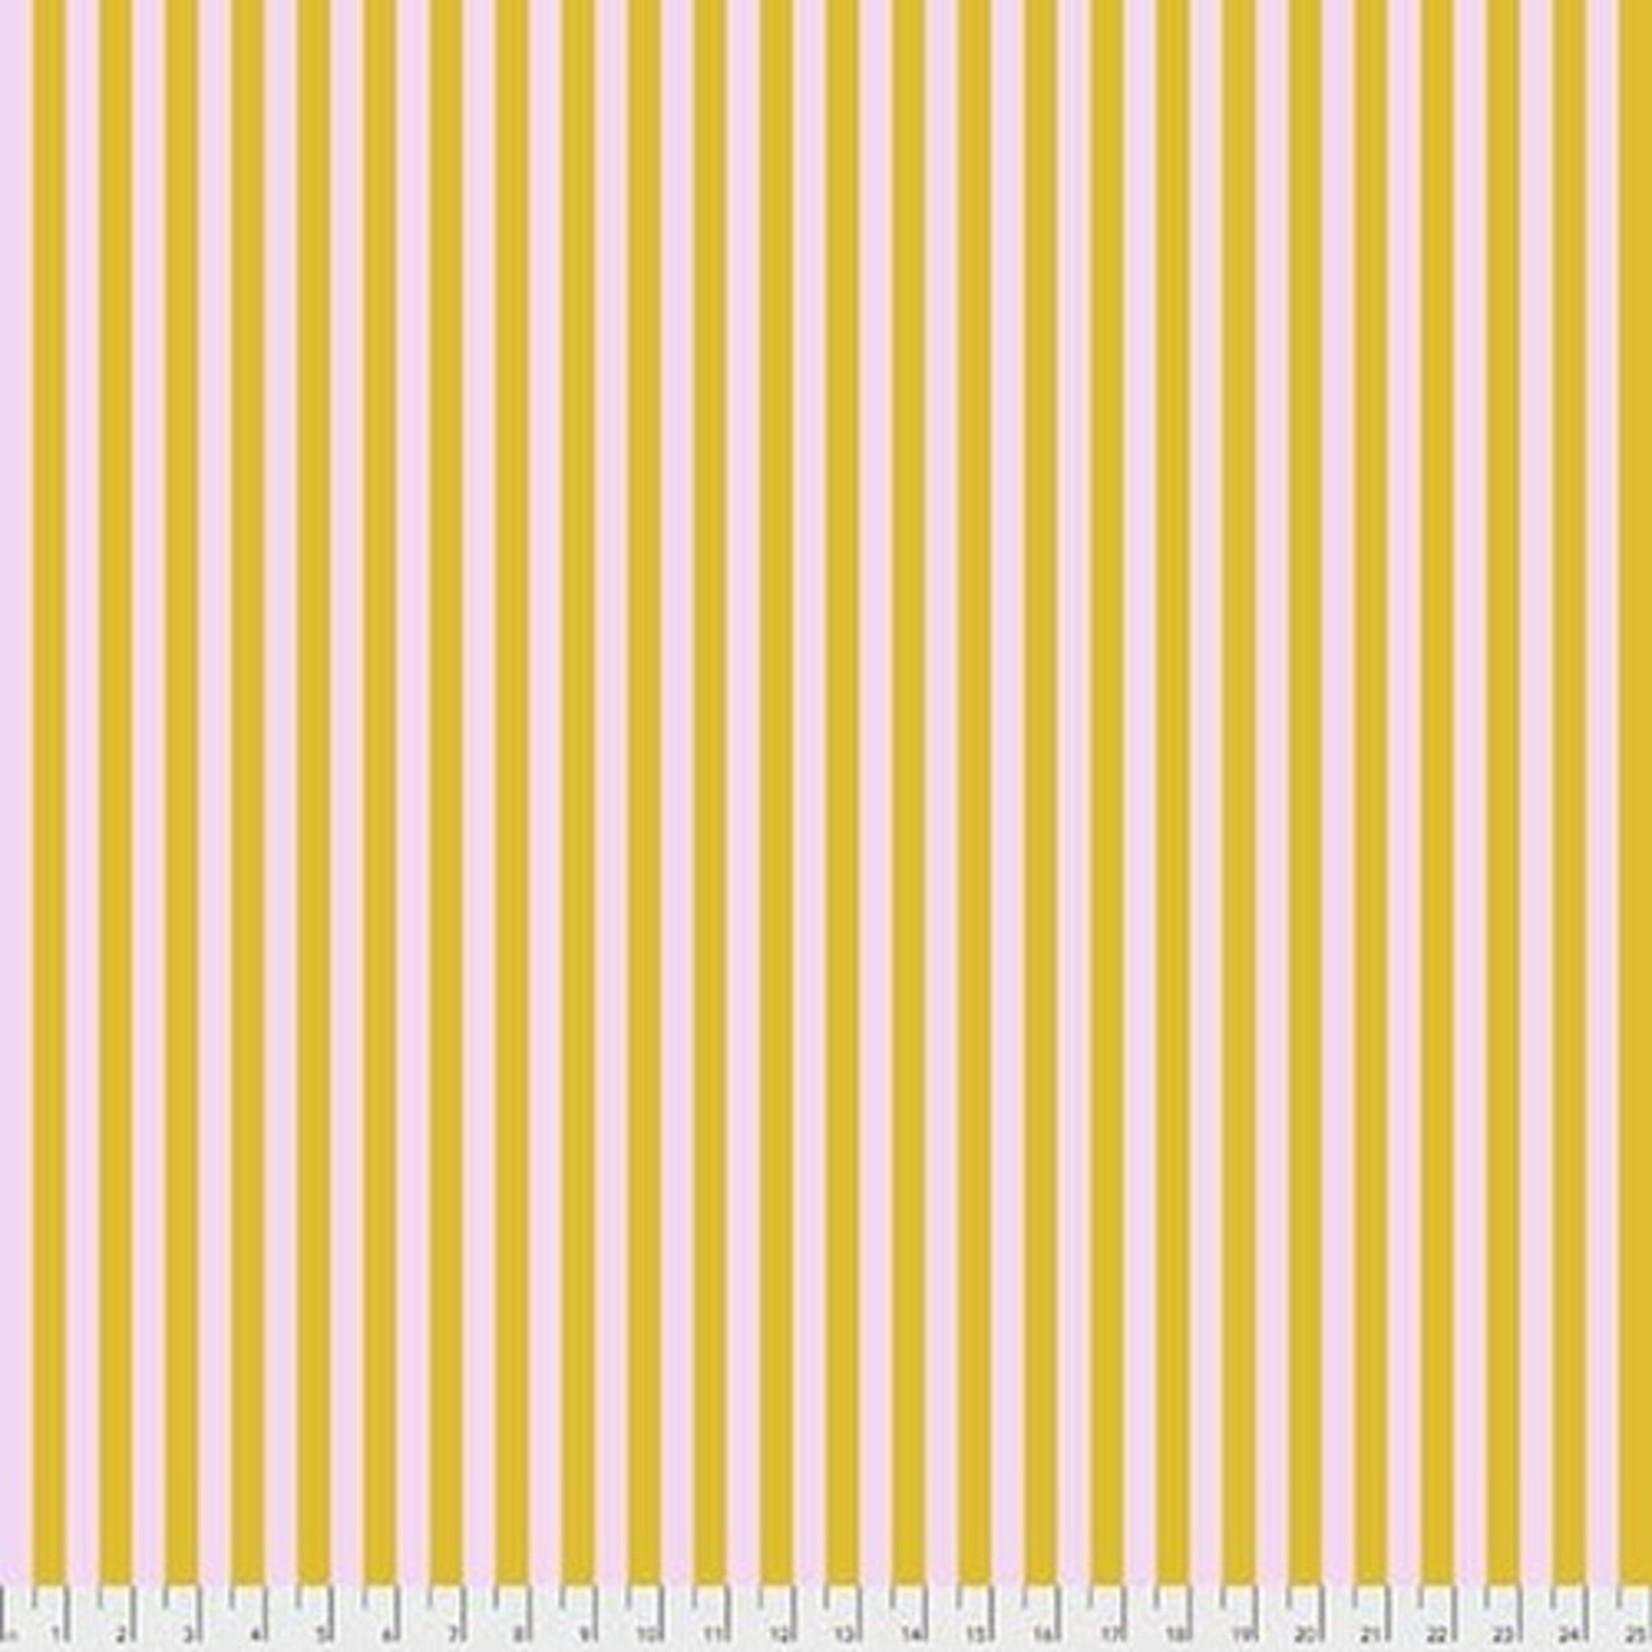 Tula Pink Tula Tent Stripe- Marigold 0.17 per cm or $17/m